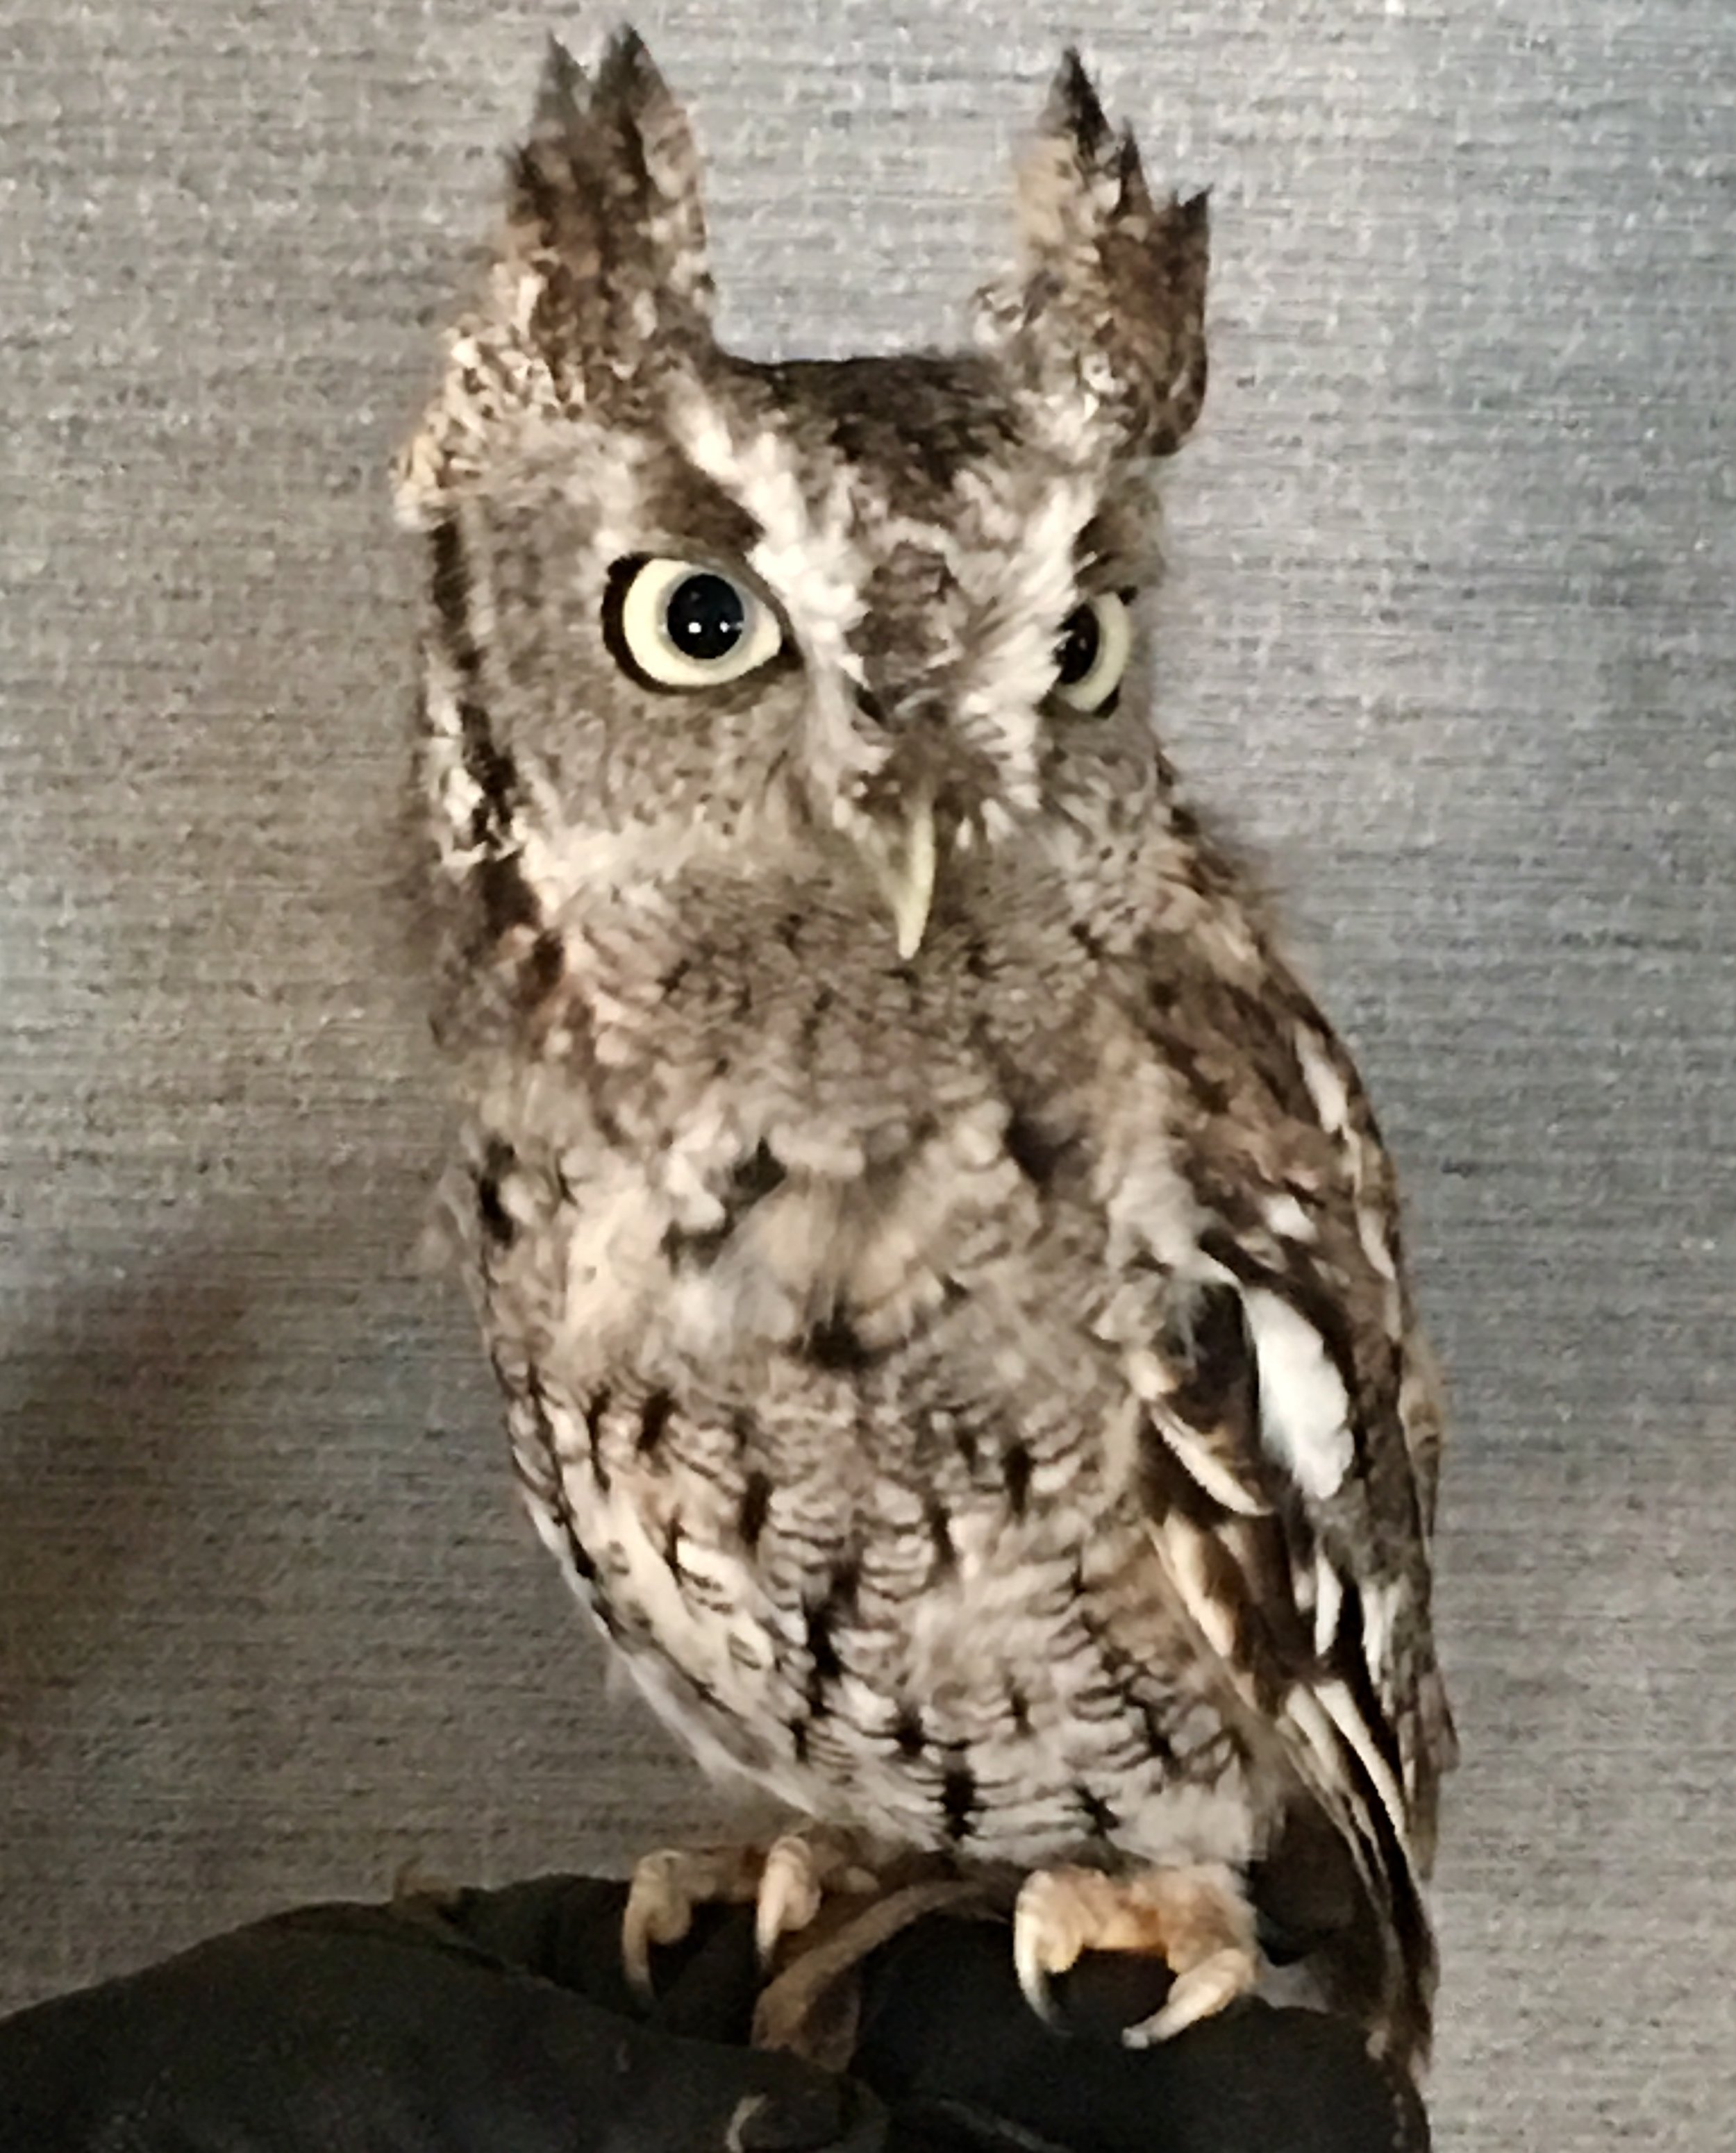 An eastern screech owl not uttering a single scream, squeak